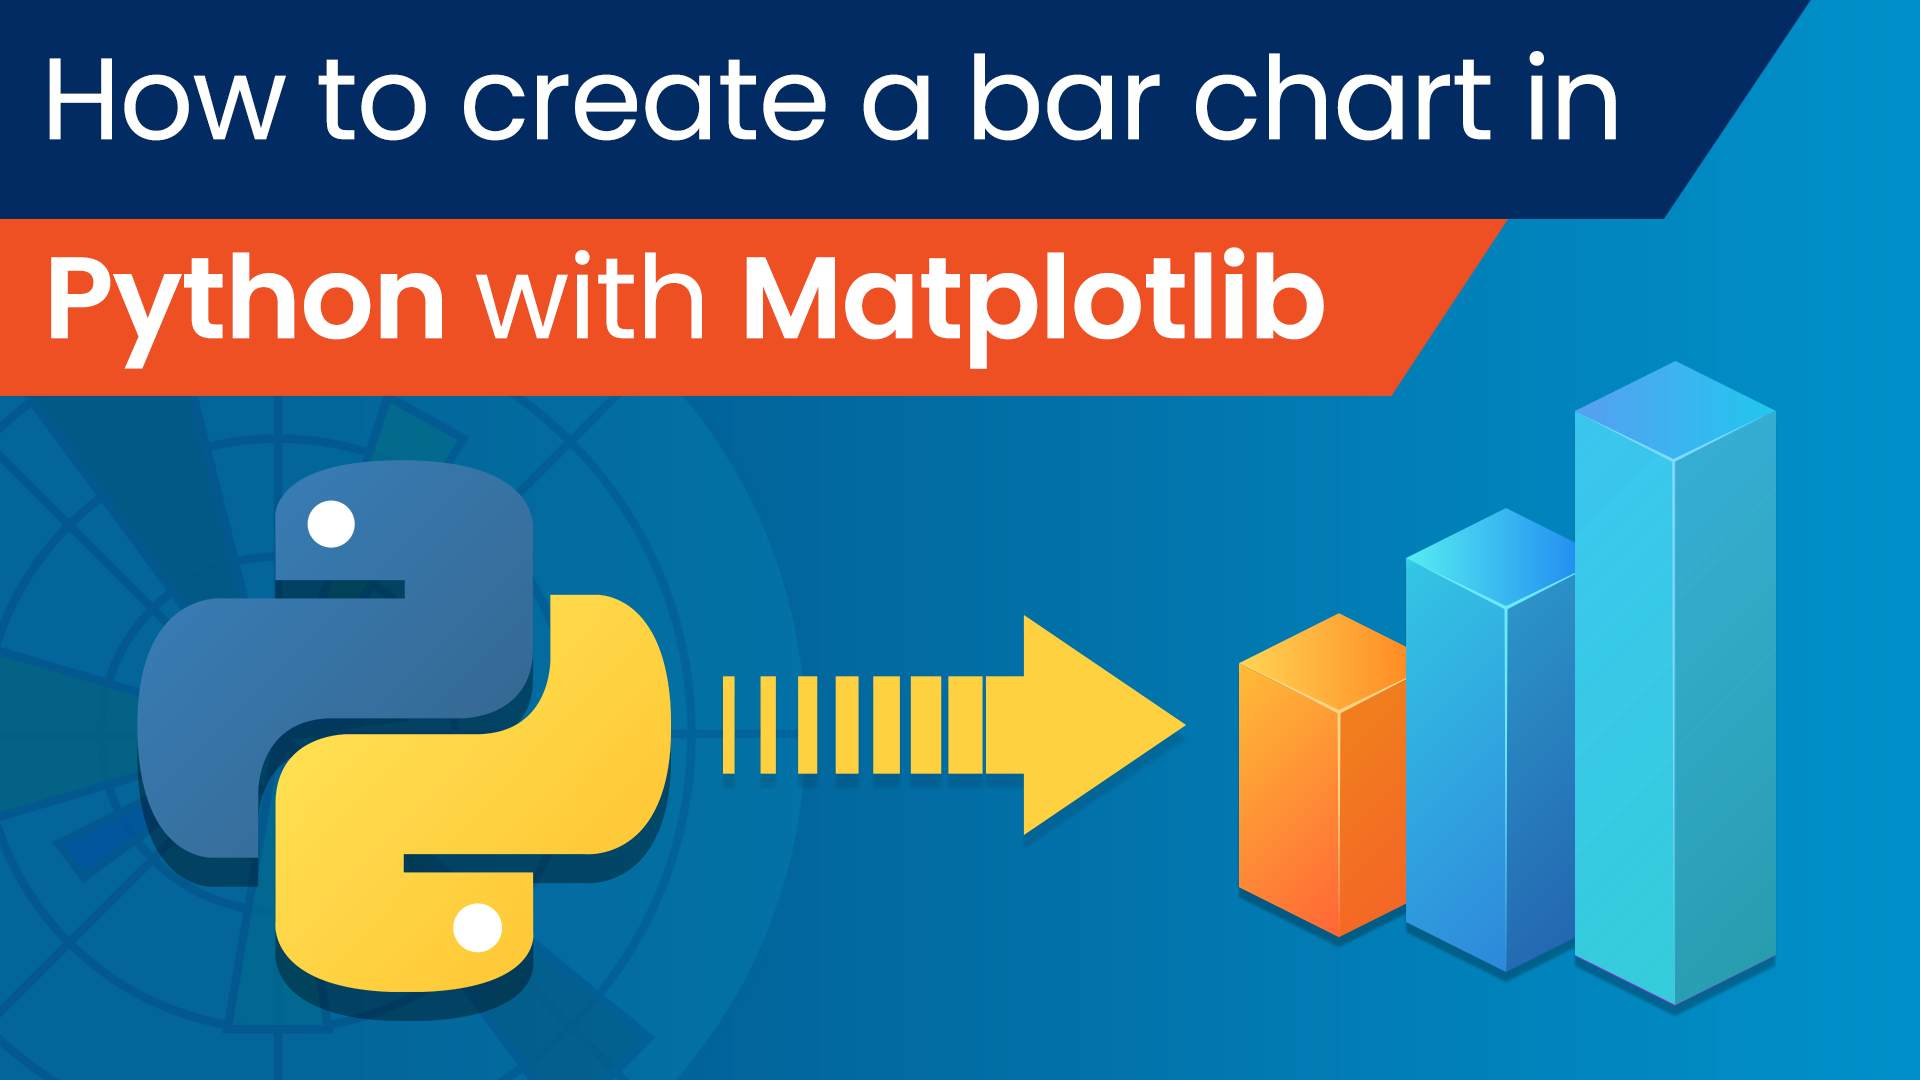 How to Create a Matplotlib Bar Chart in Python?